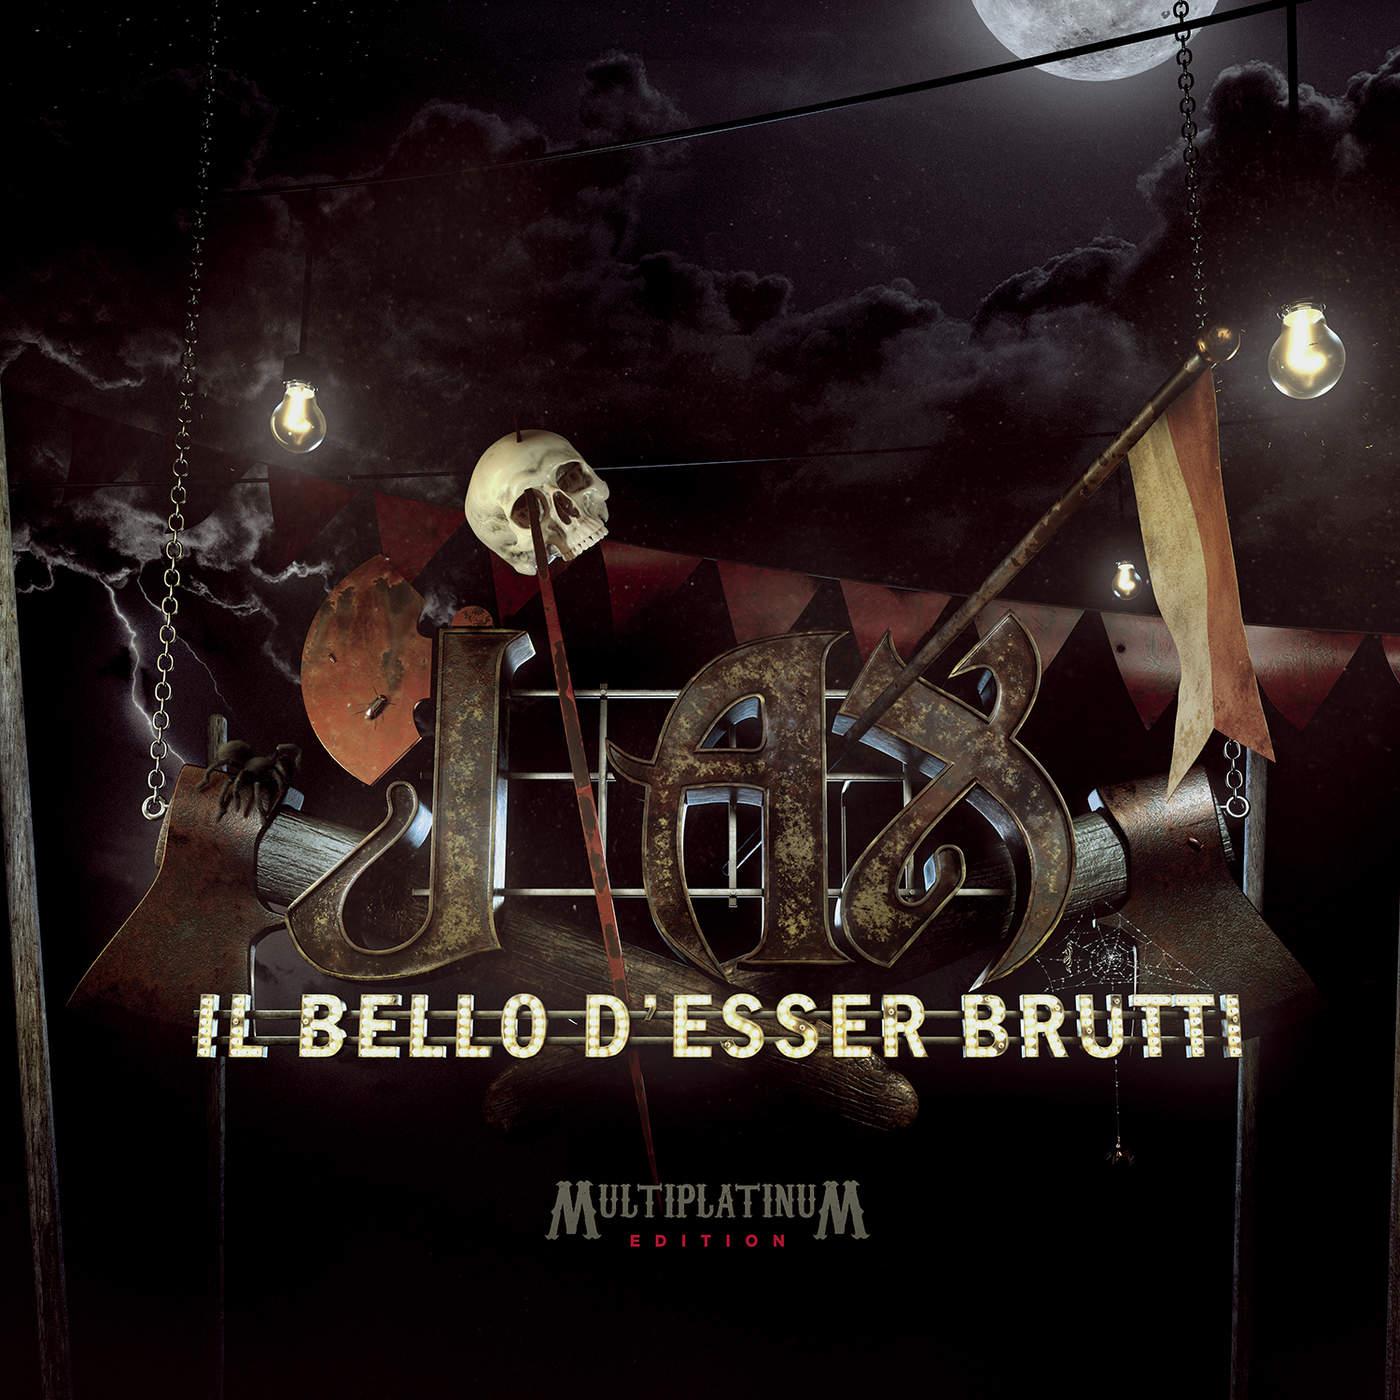 J-AX - Intro (ft. Bianca Atzei)(Bonus Track)(iTunes)(2015).mp4+m4a